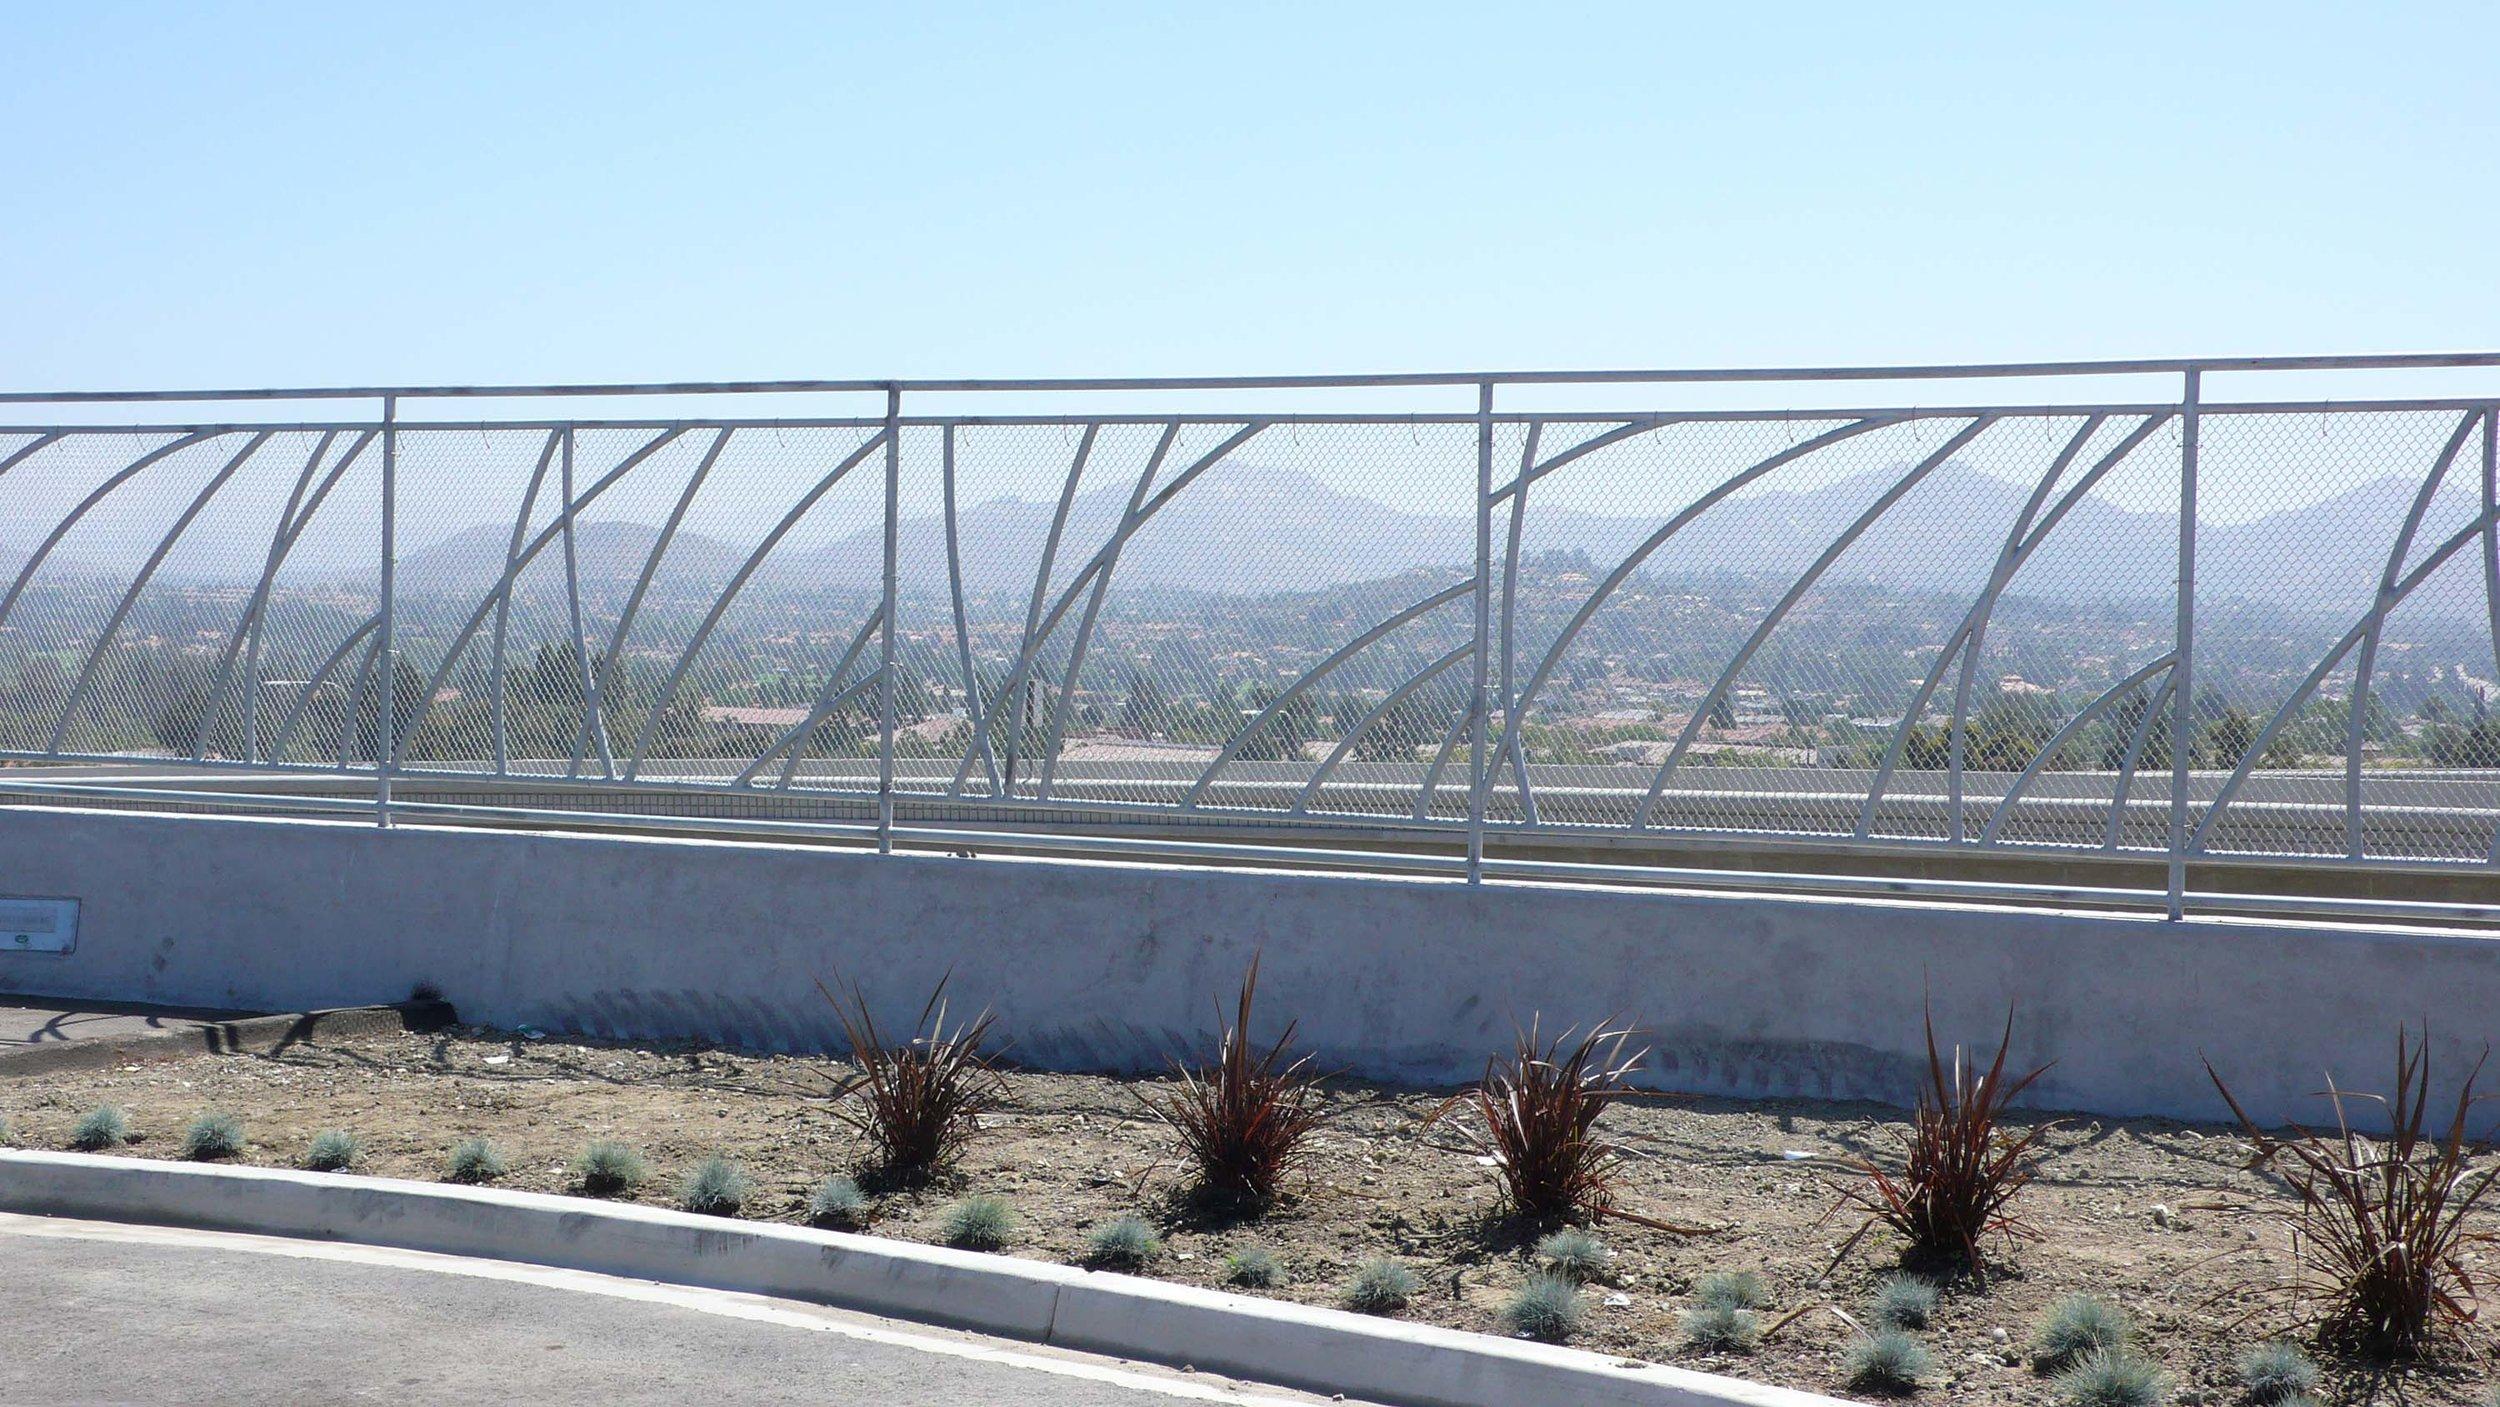 Perimeter Fence - Rancho Bernardo Bus Rapid Transit Station